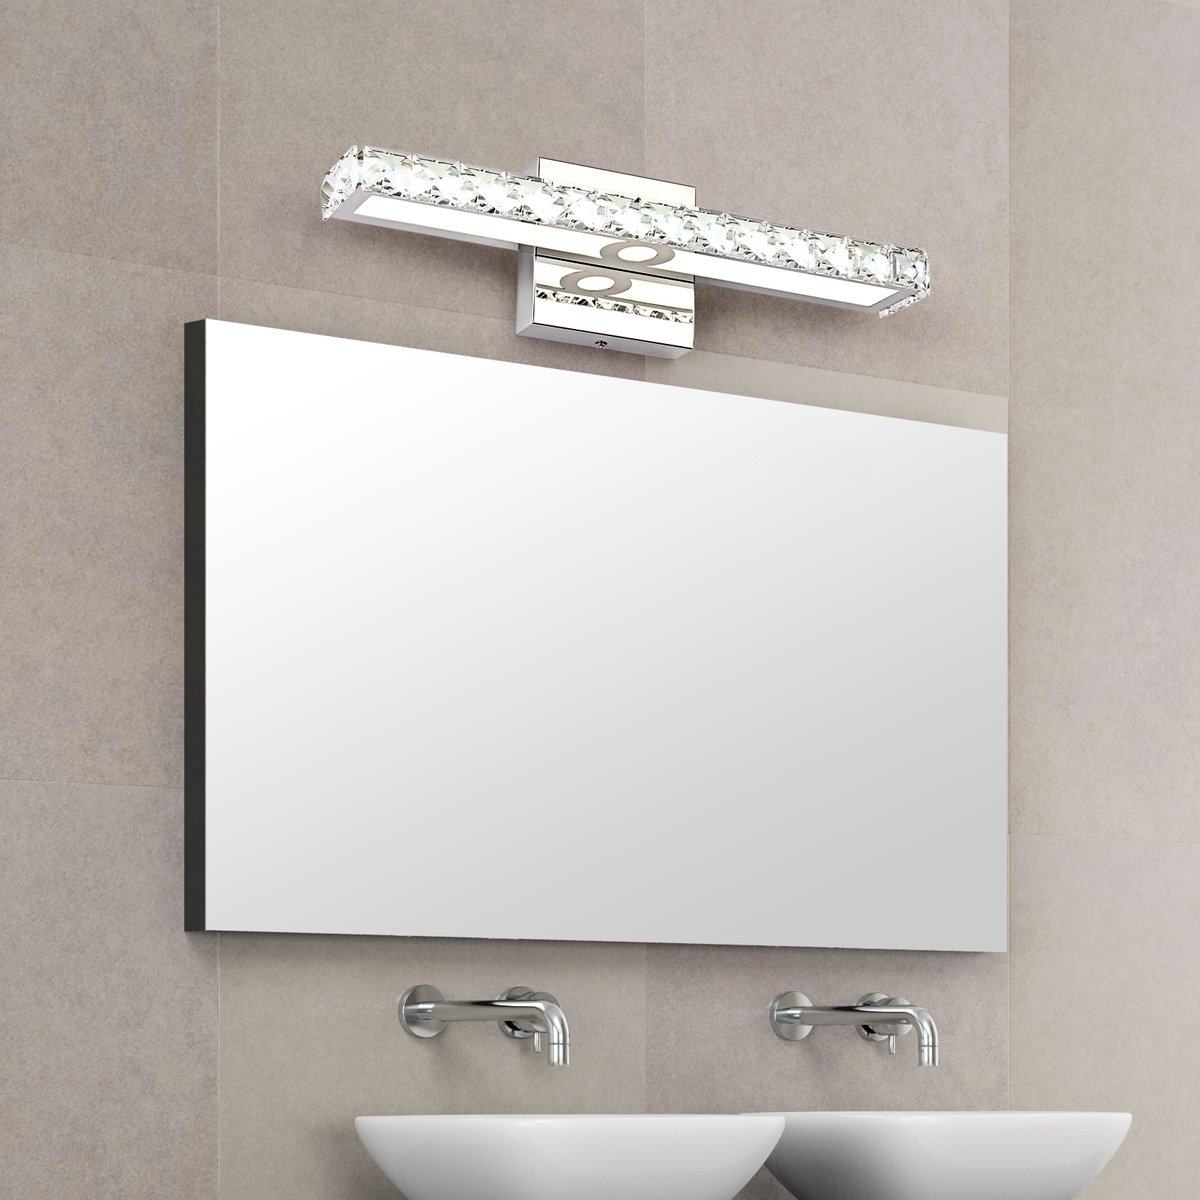 JUSHENG 16W Bathroom Vanity Light, LED Crystal Bathroom Light Fixtures Up Mirror Light, 16W 1500 Lumen Bathroom Bedroom Lighting (Transparent Daylight White)